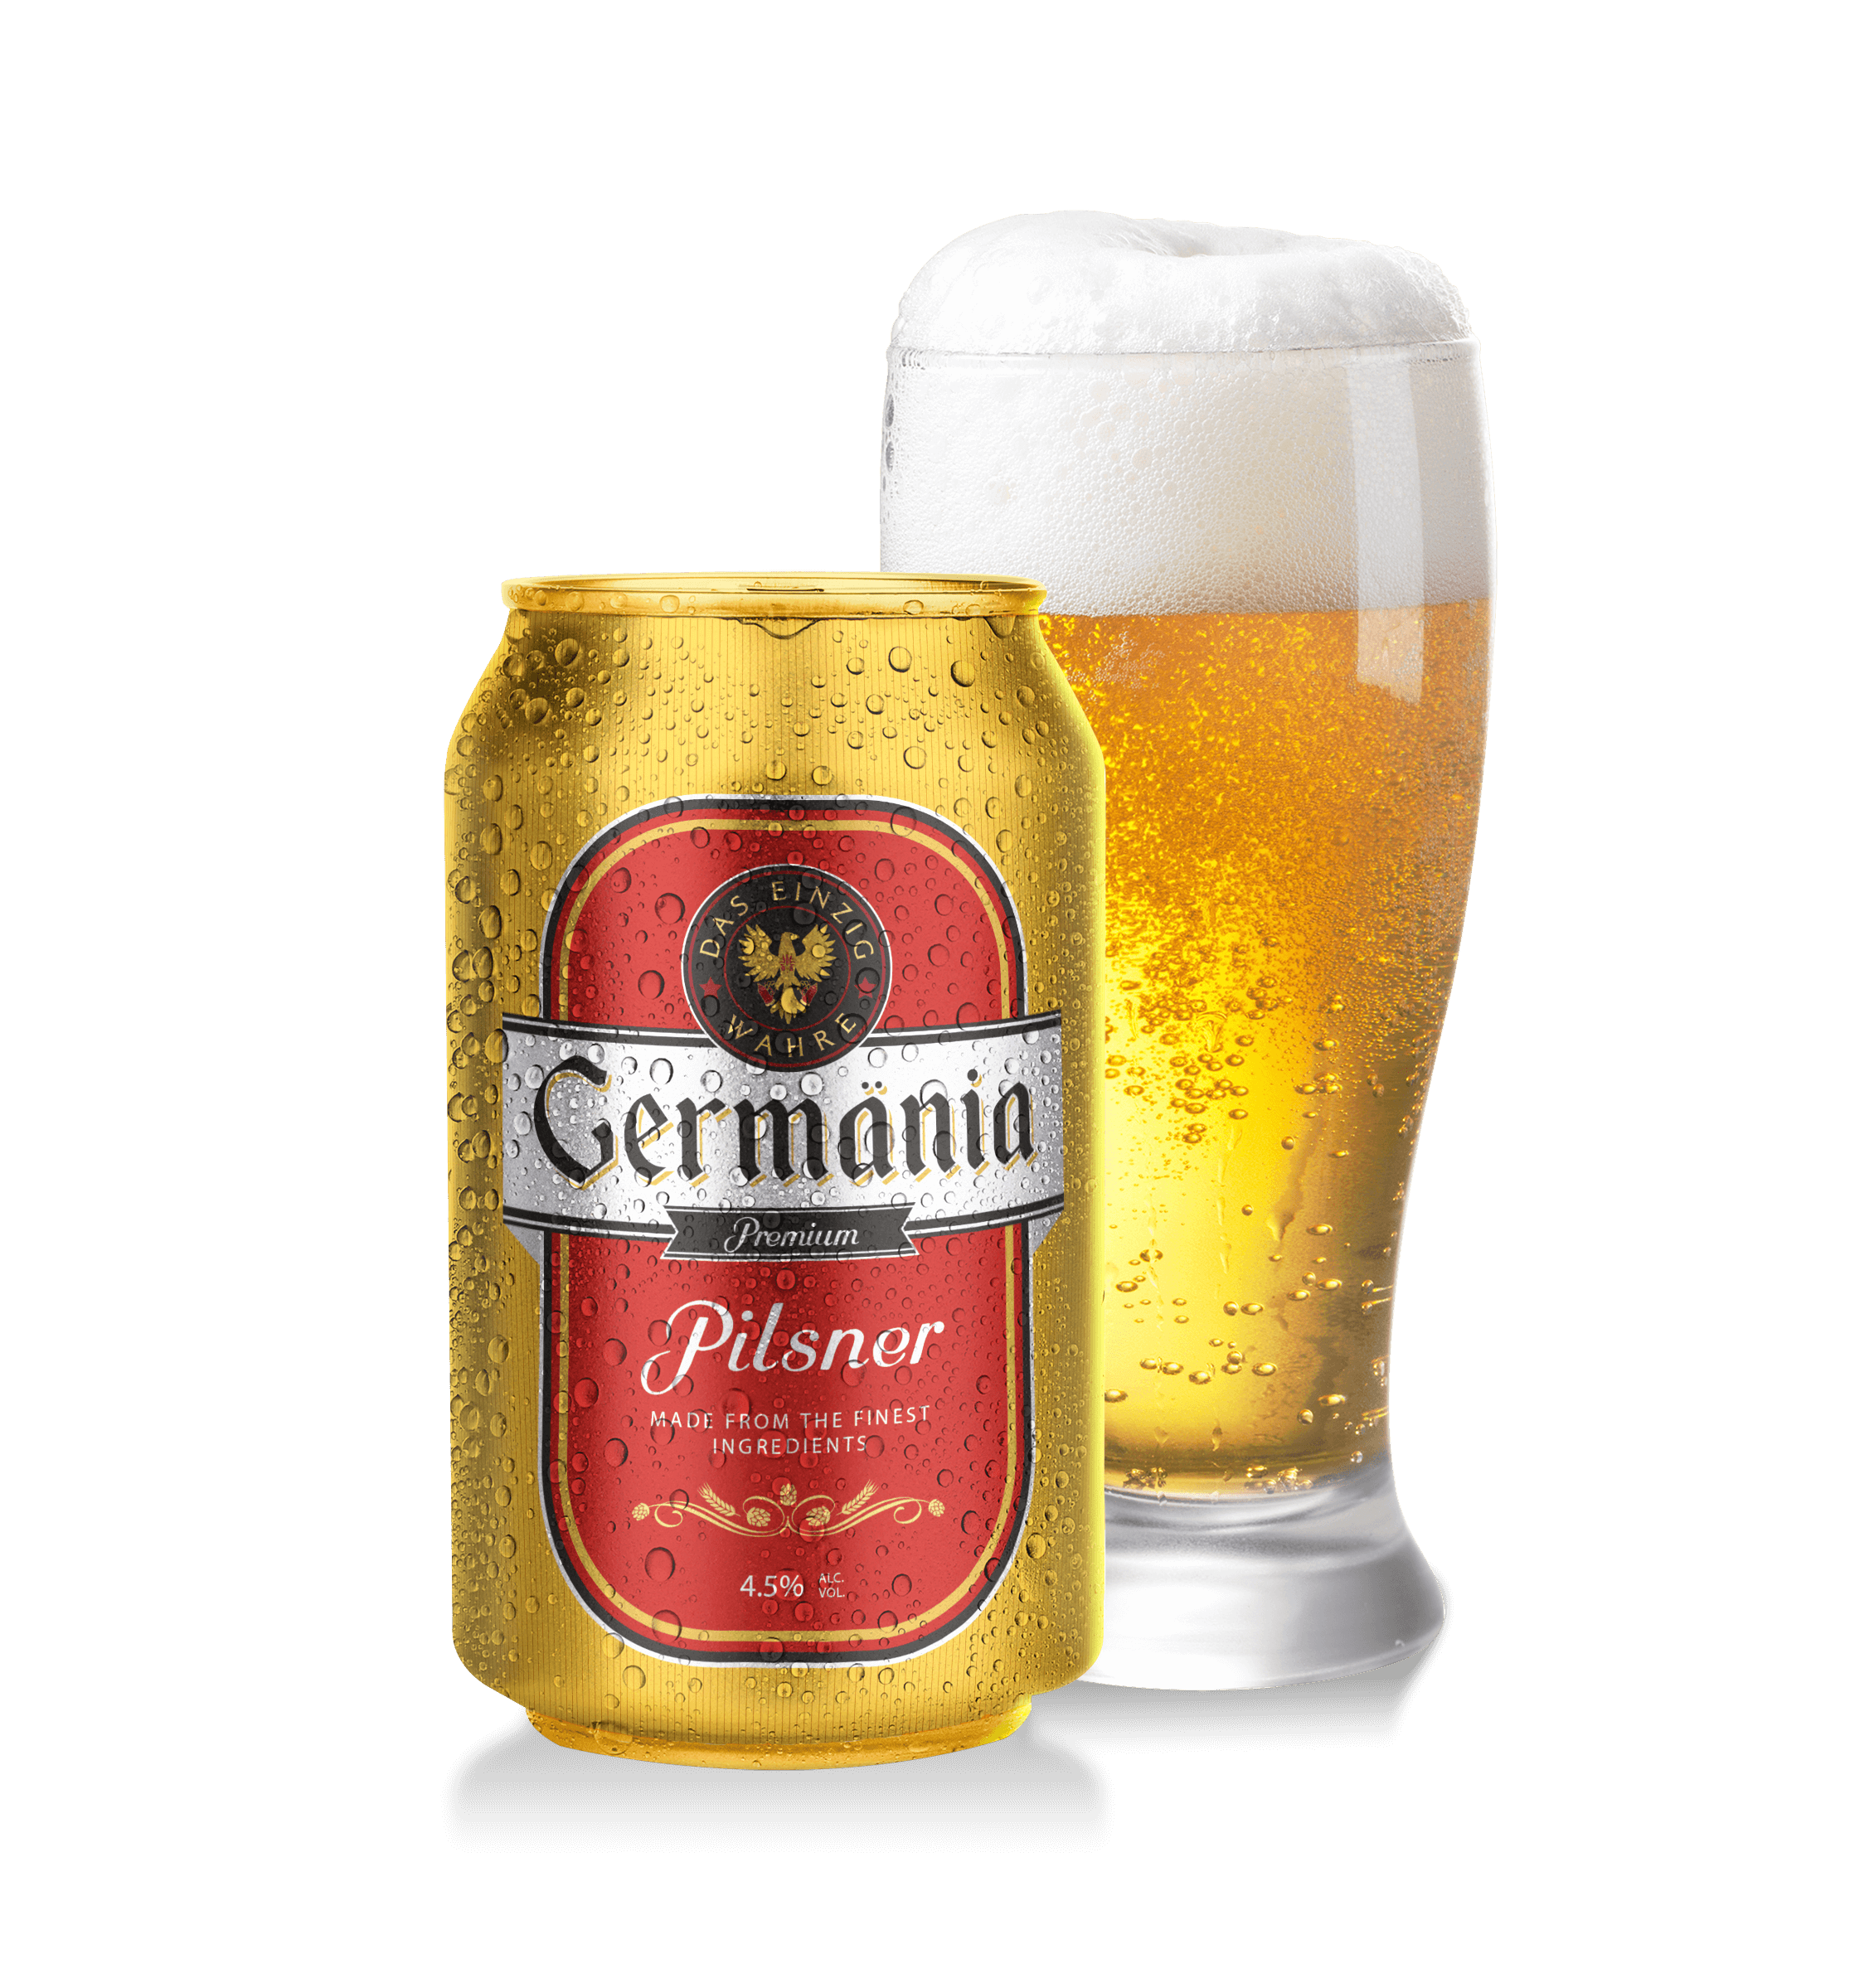 Lata de Cerveza Germänia con vaso cervecero